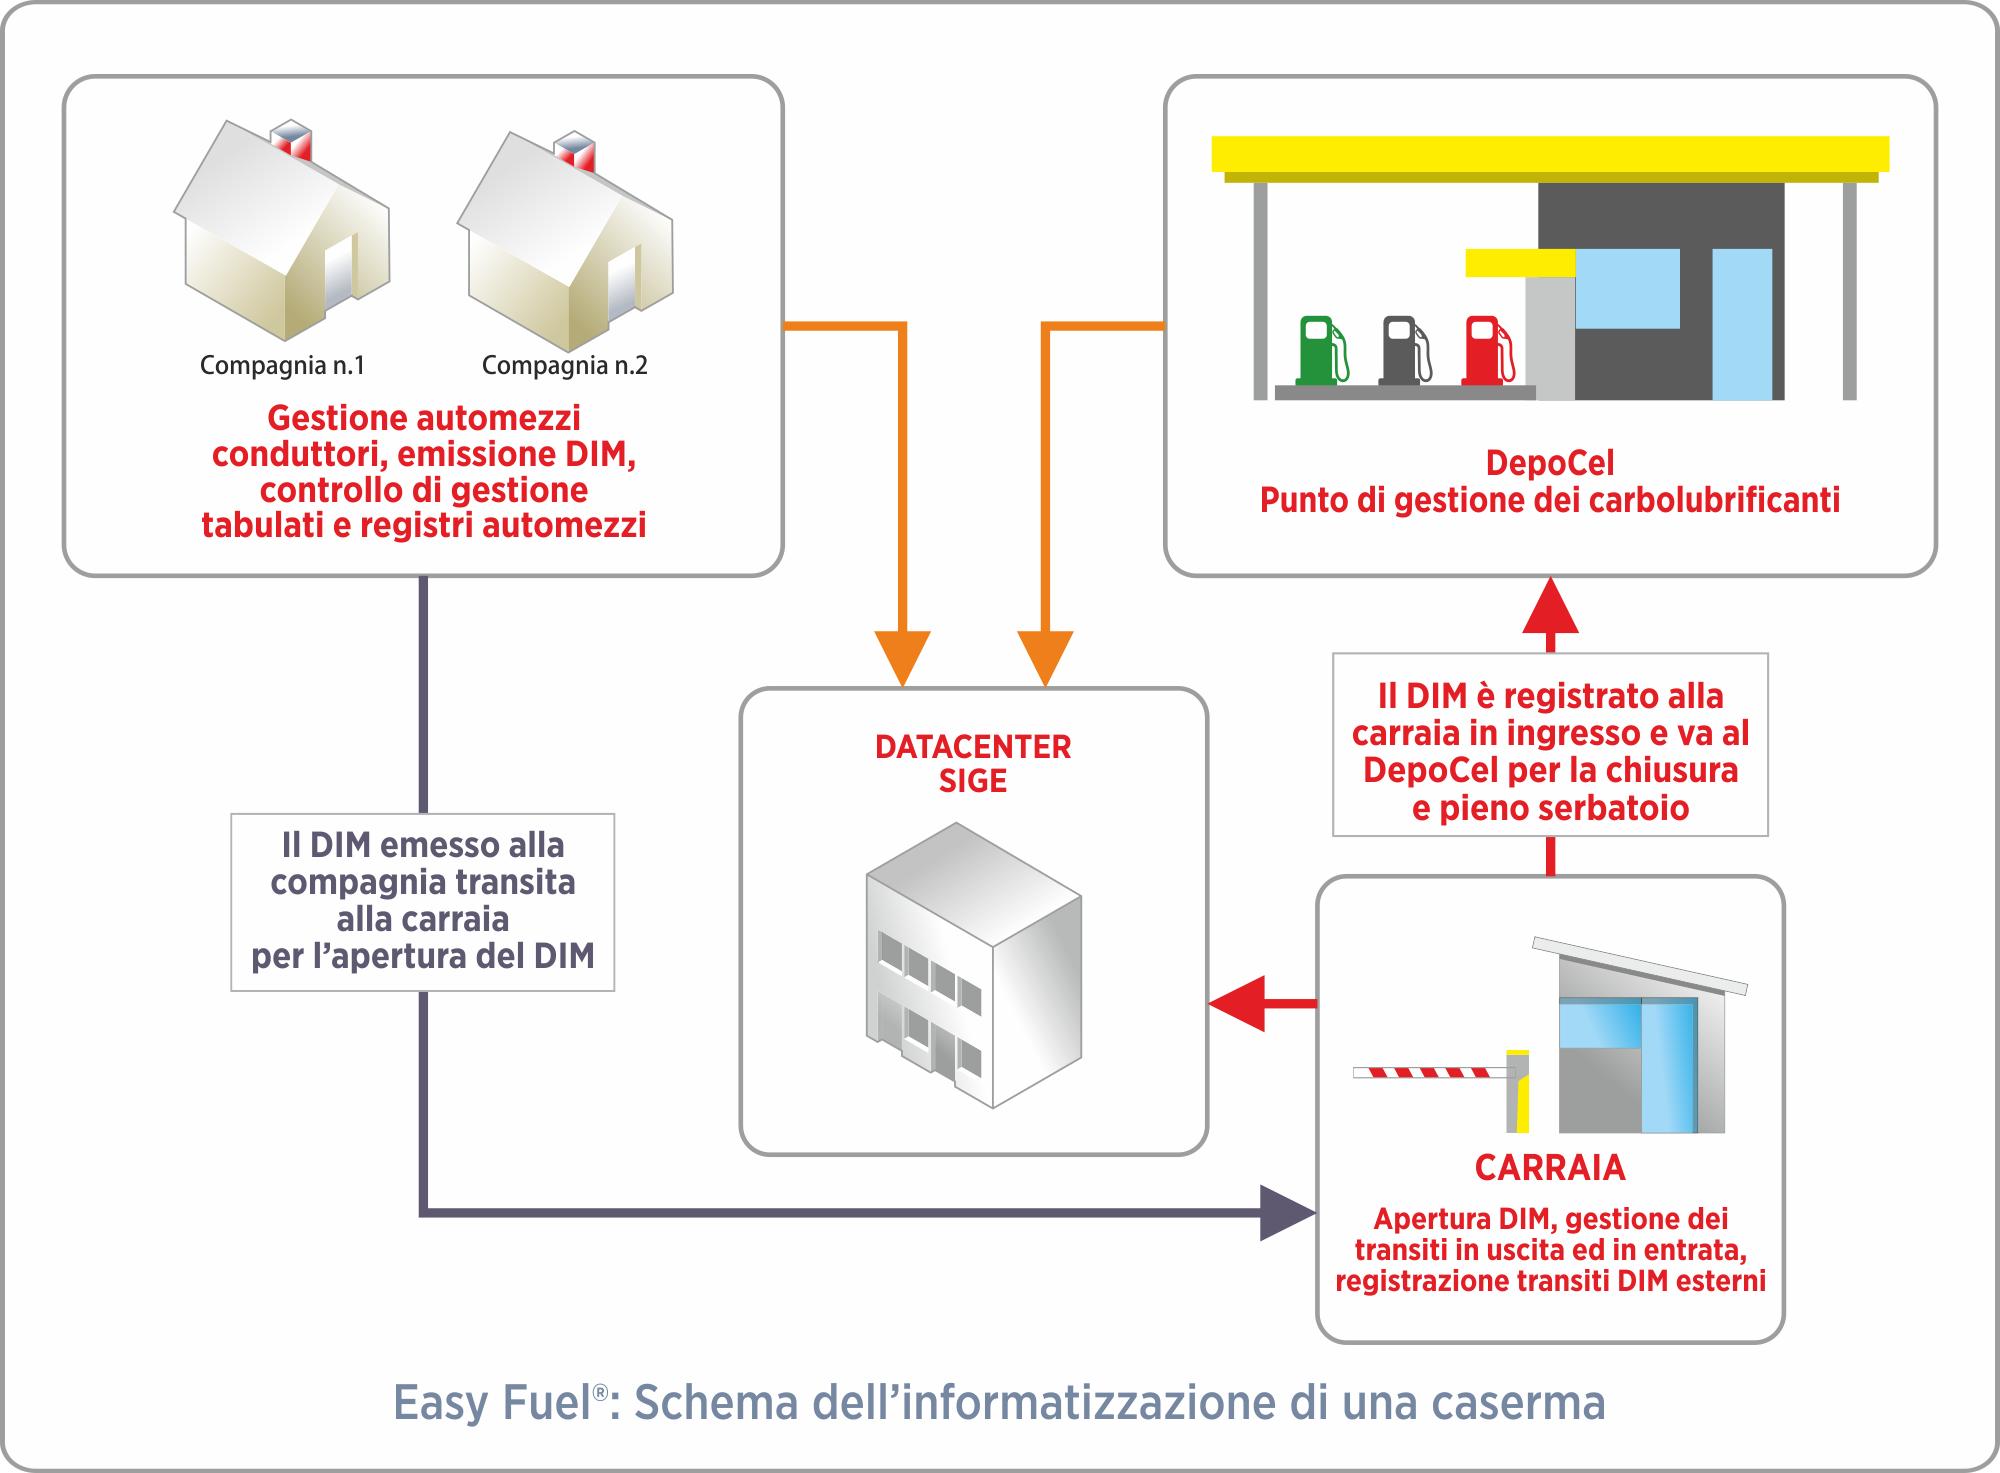 easy-fuel-informatizzazione-caserma-1